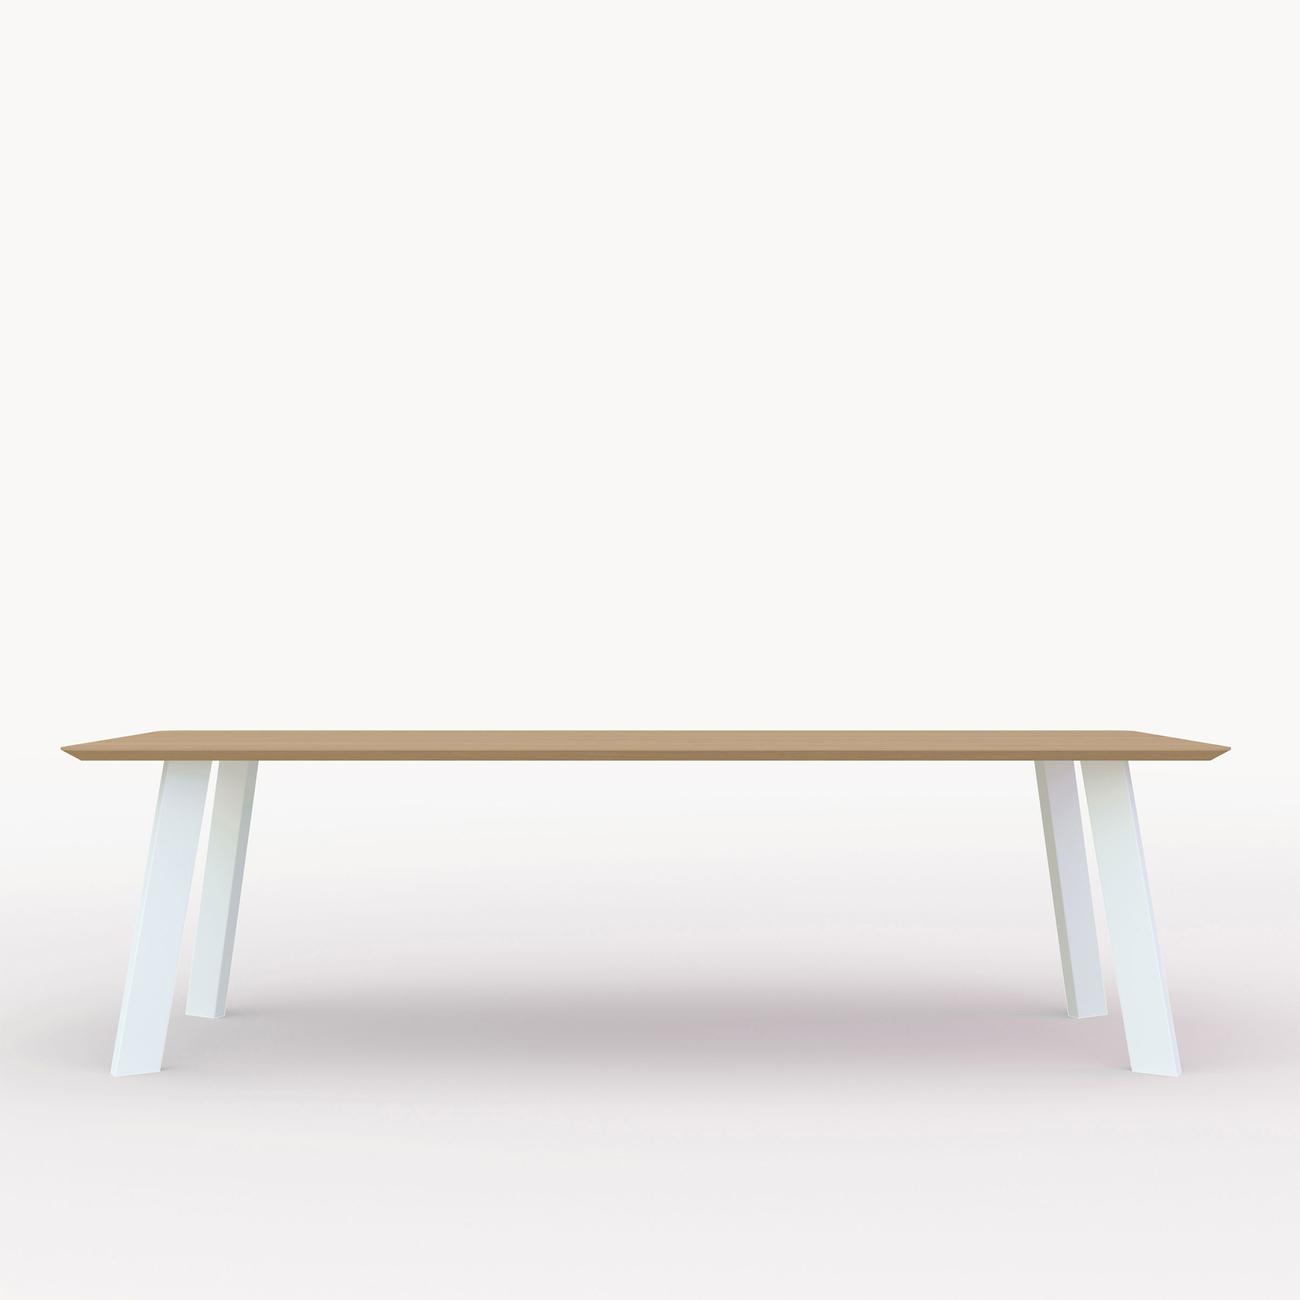 Studio HENK New Co tafel wit frame 4 cm 220x90 cm Hardwax oil natural